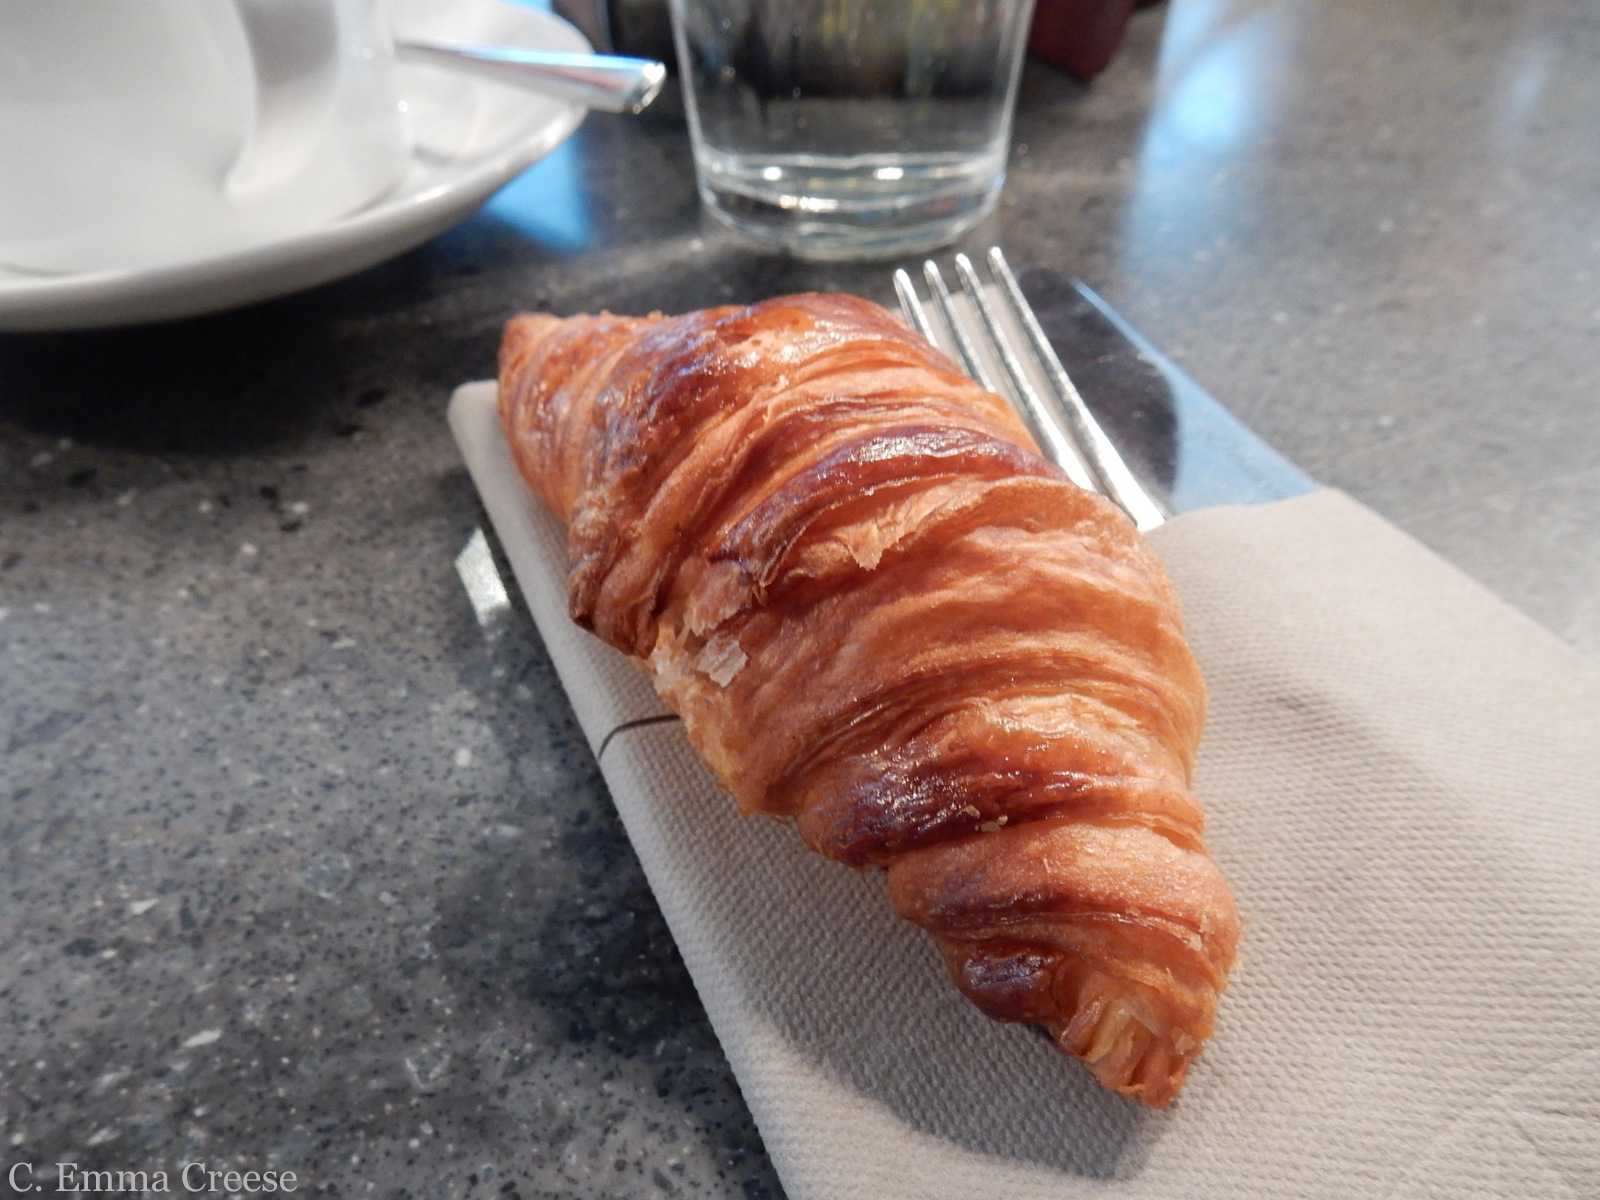 Brunch with a view Darwin Brasserie Walkie Talkie Adventures of a London Kiwi